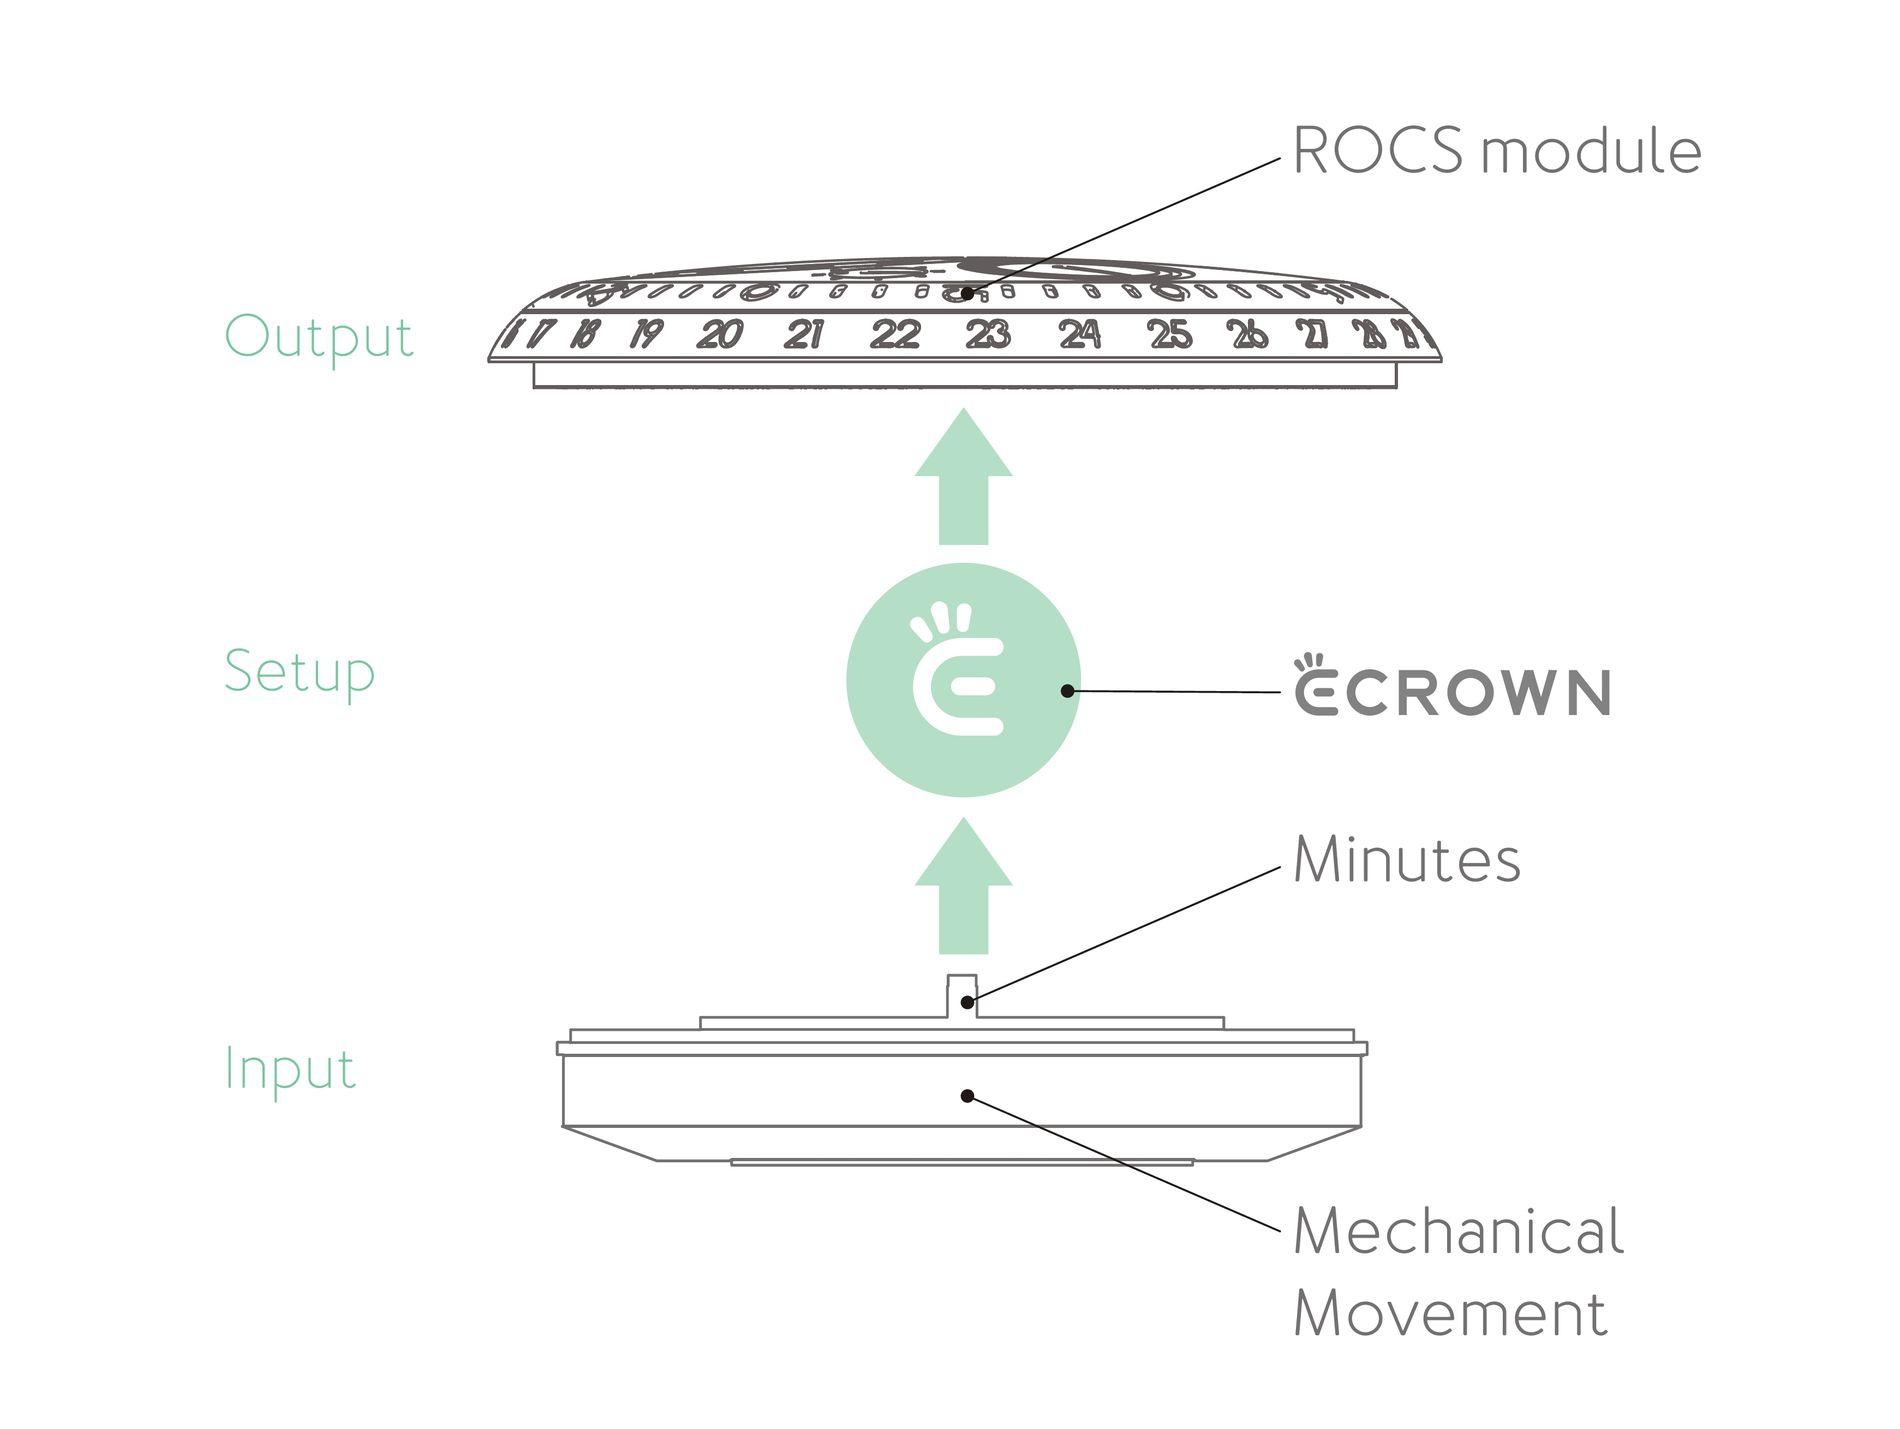 ressence-e-crown-architecture_result